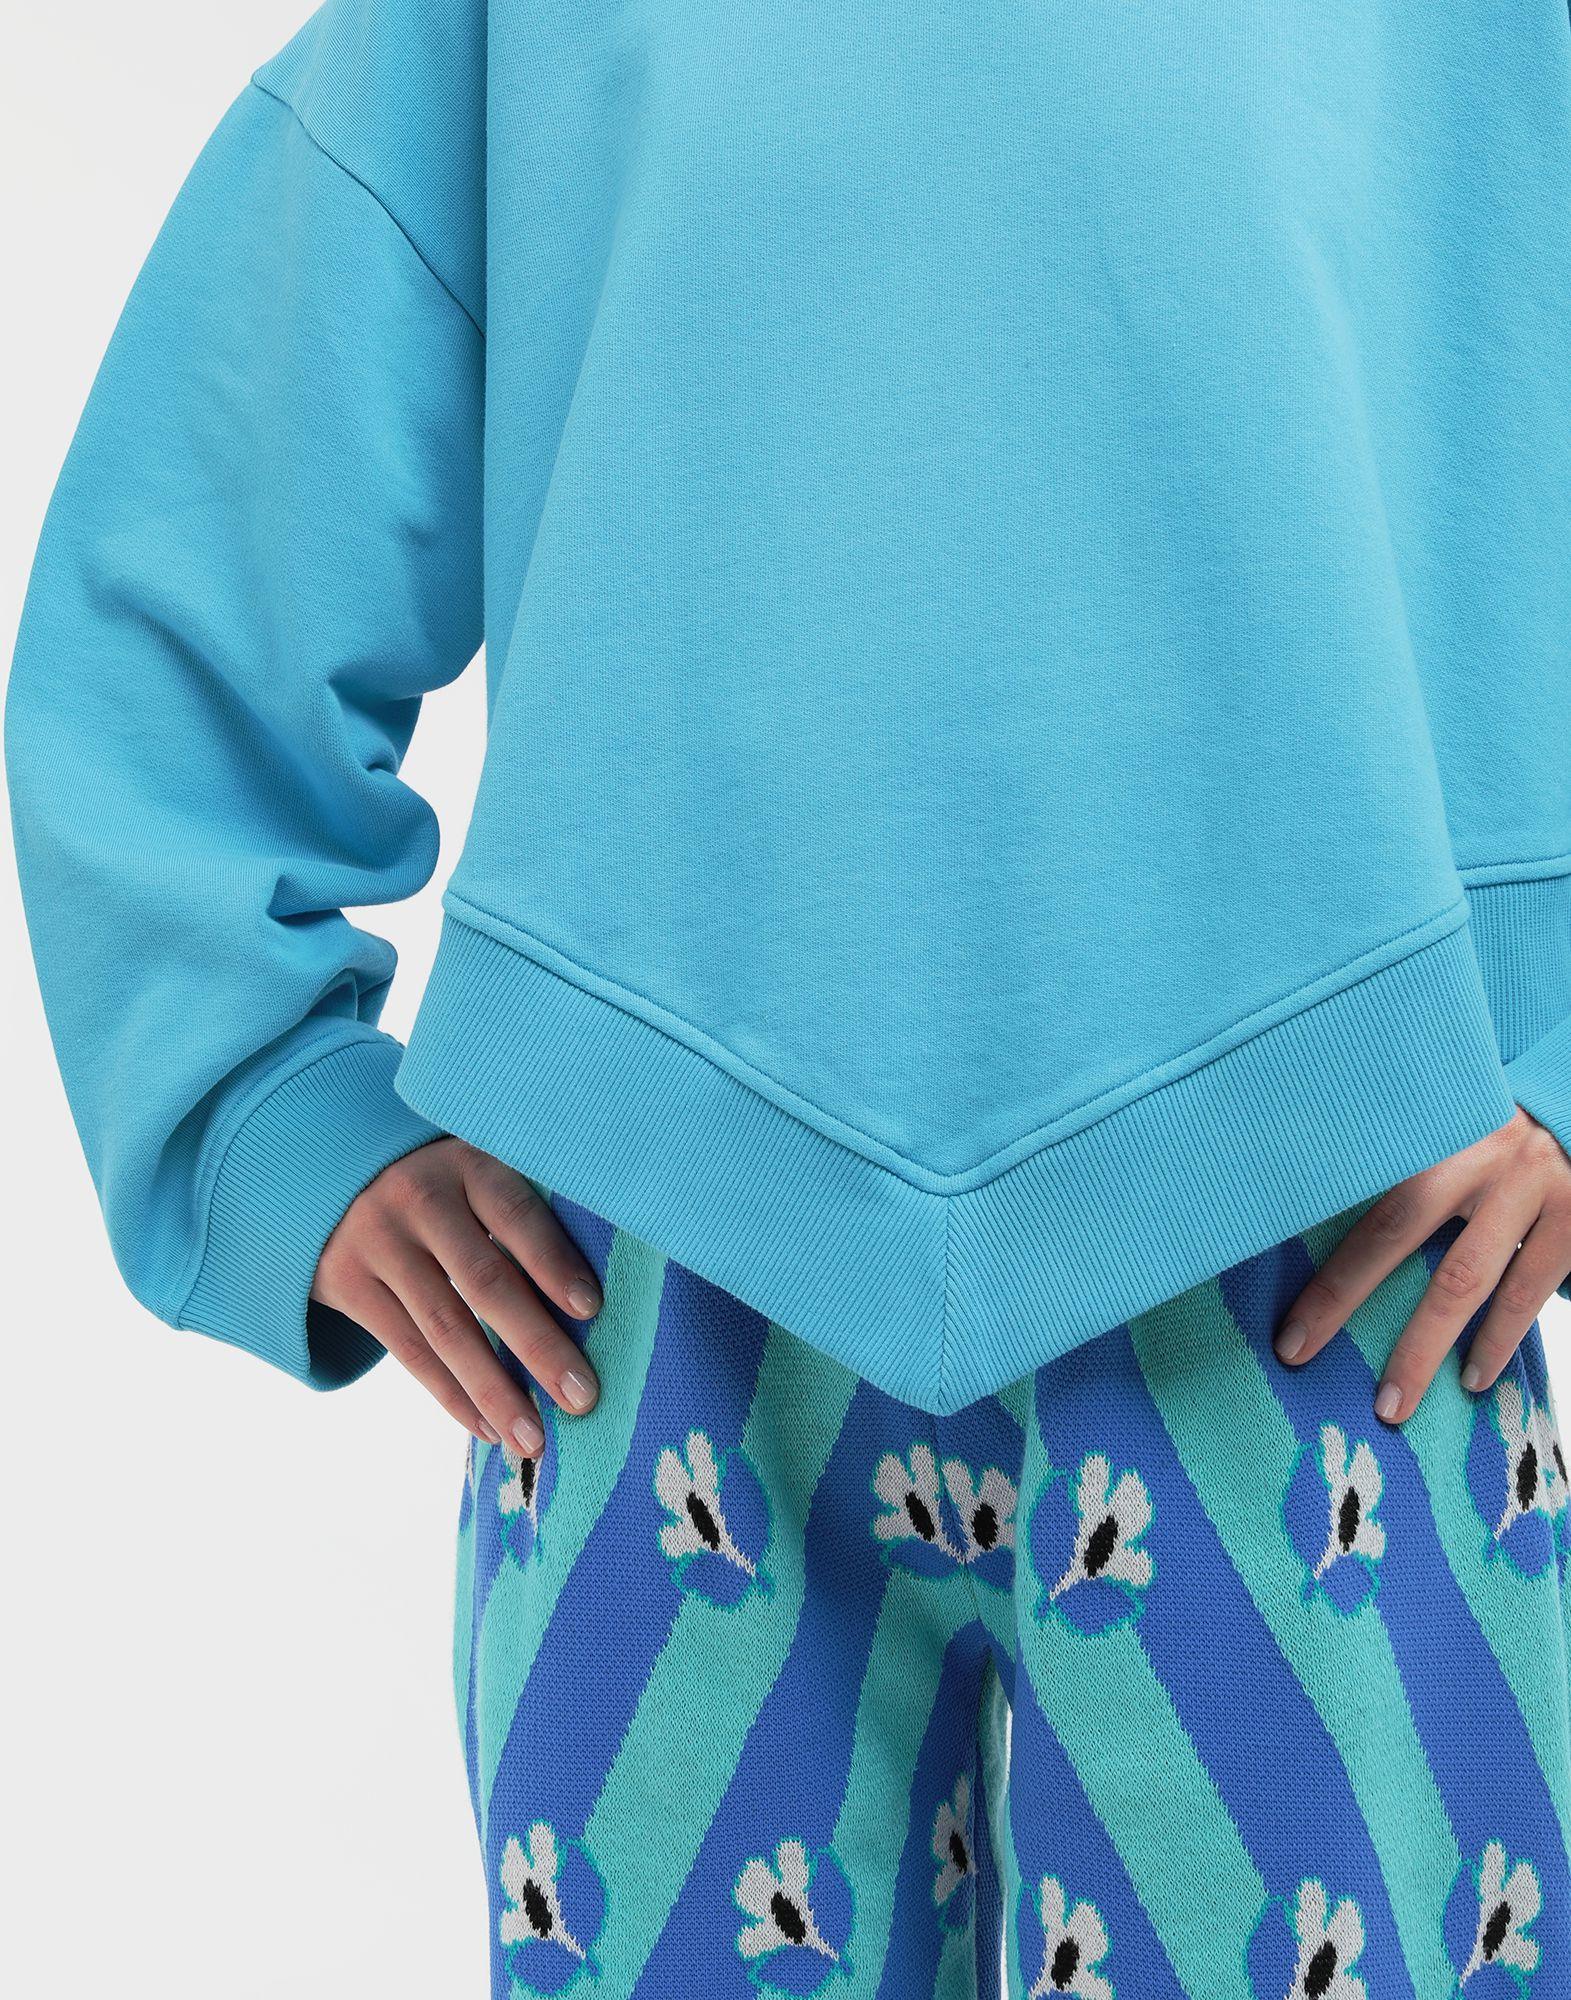 MM6 MAISON MARGIELA Oversized jersey sweatshirt Sweatshirt Woman b